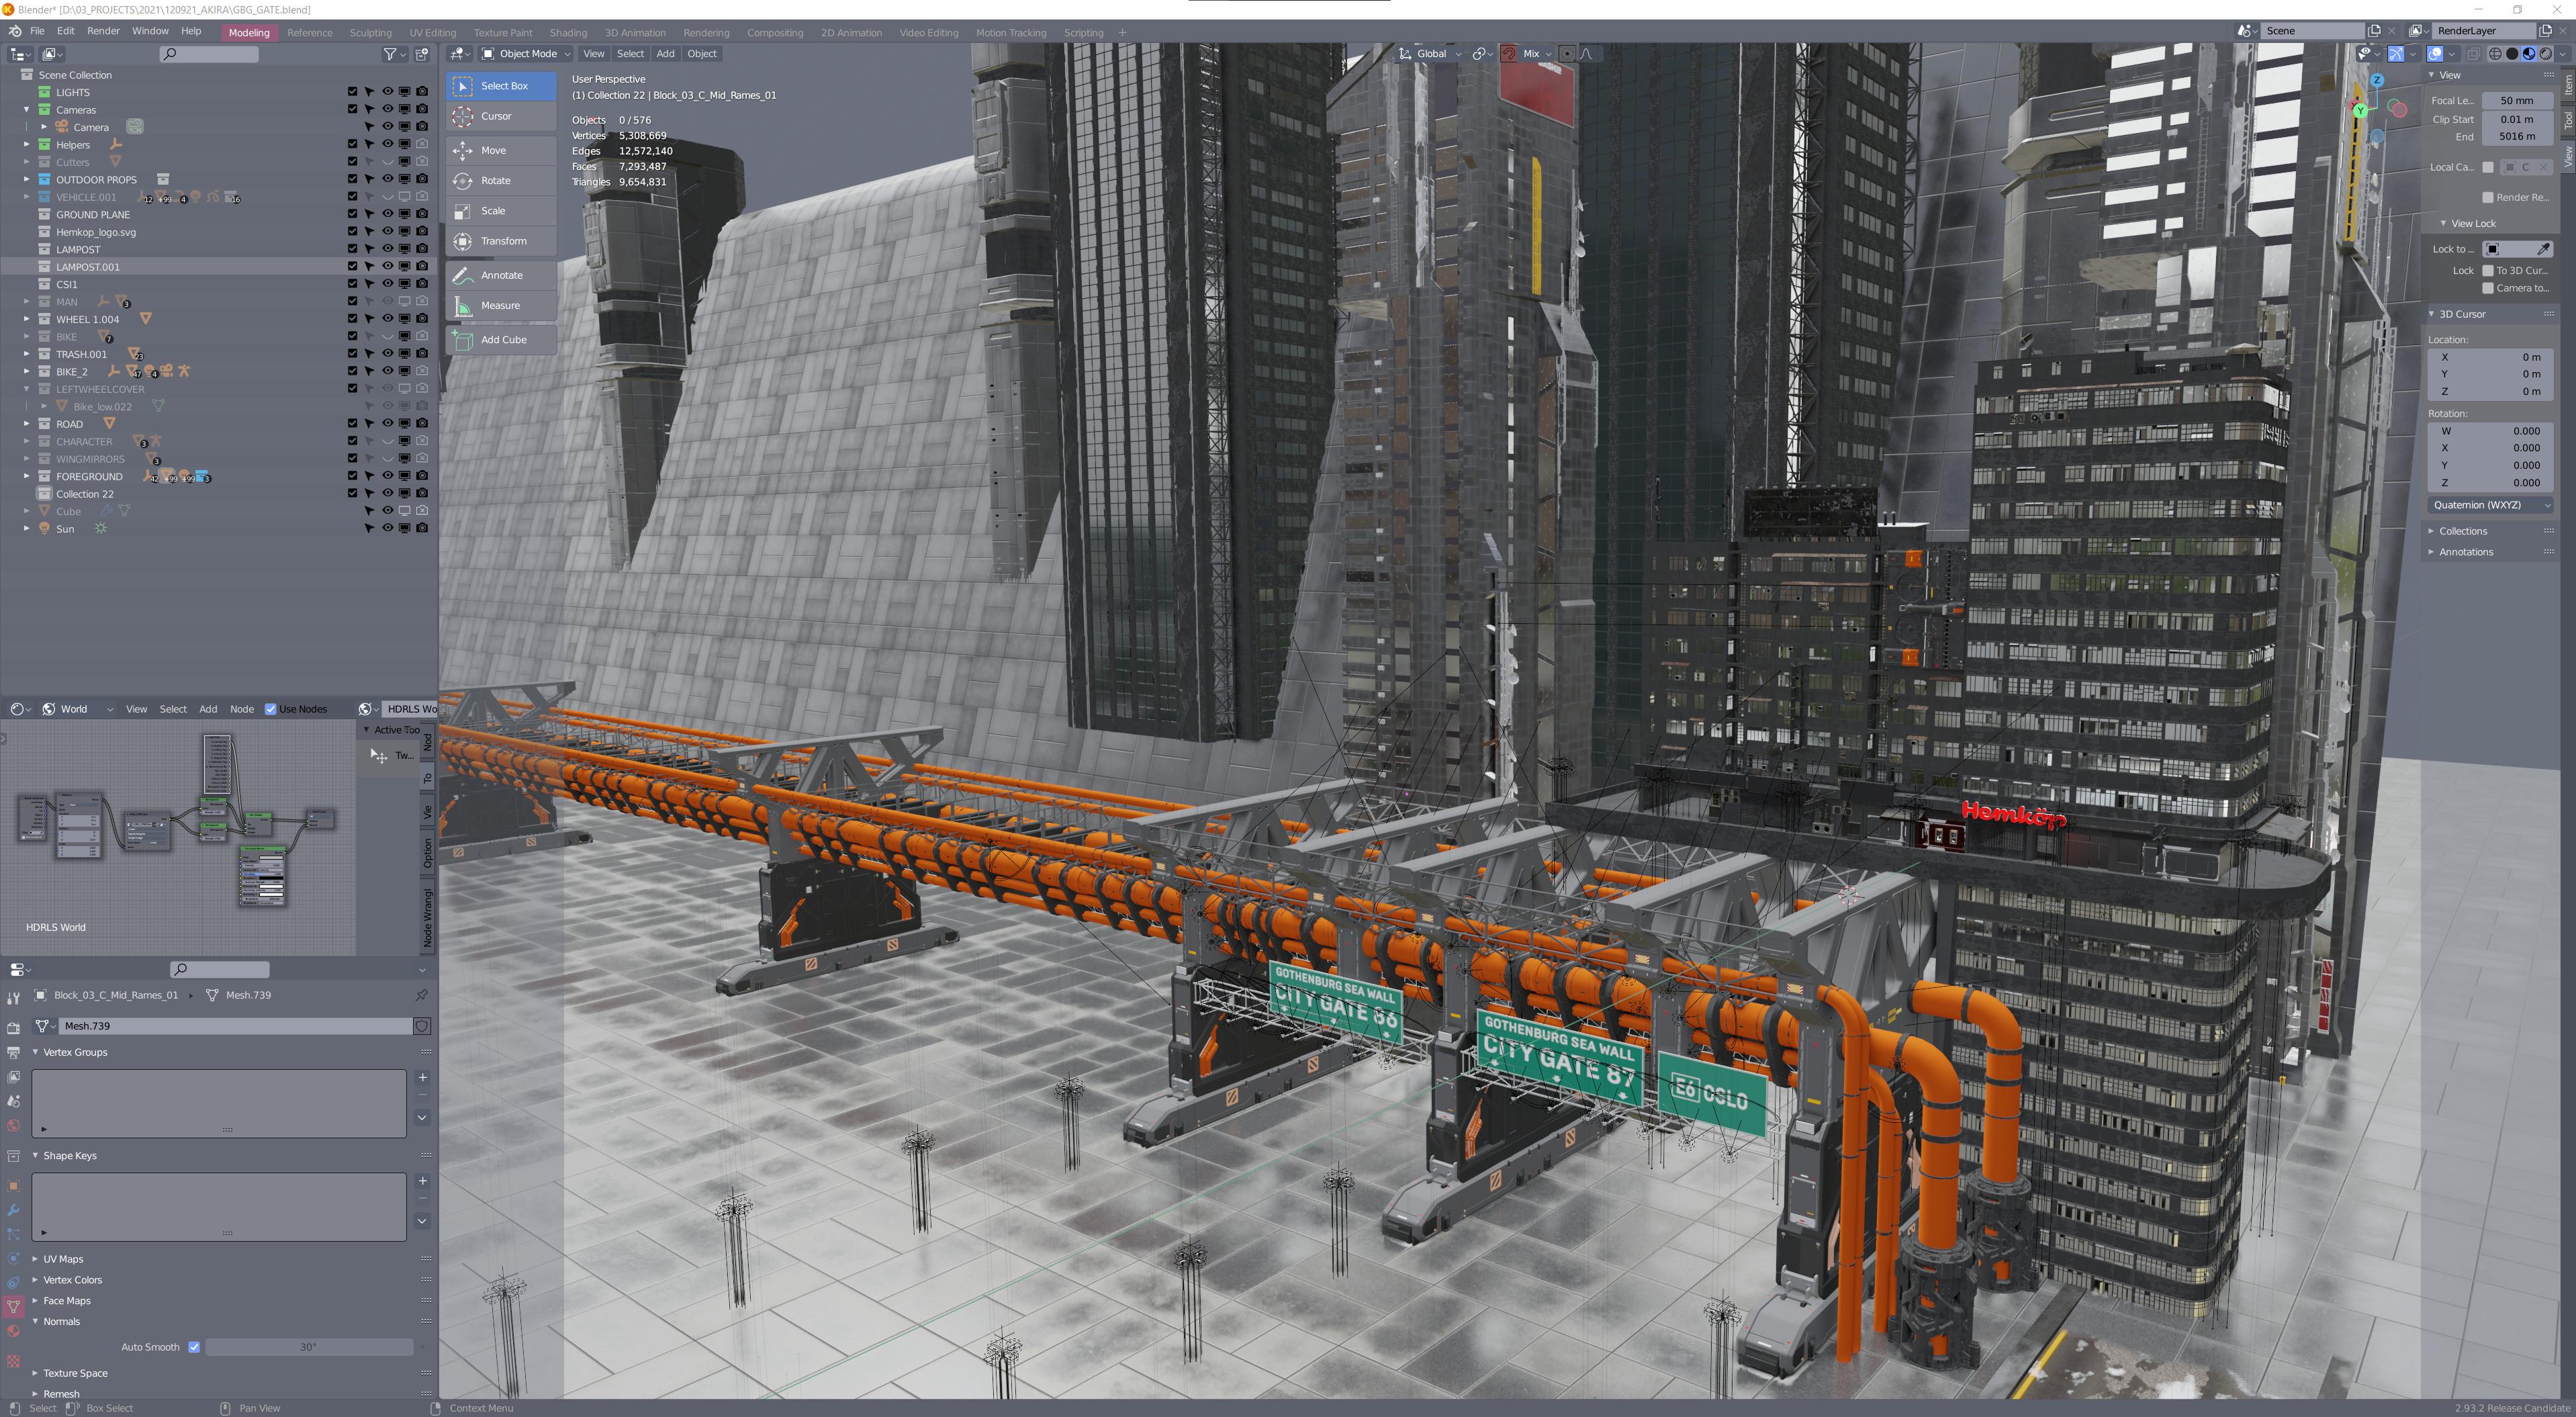 City details, kitbash sets from Kitbash3D and Chtazi Nazka